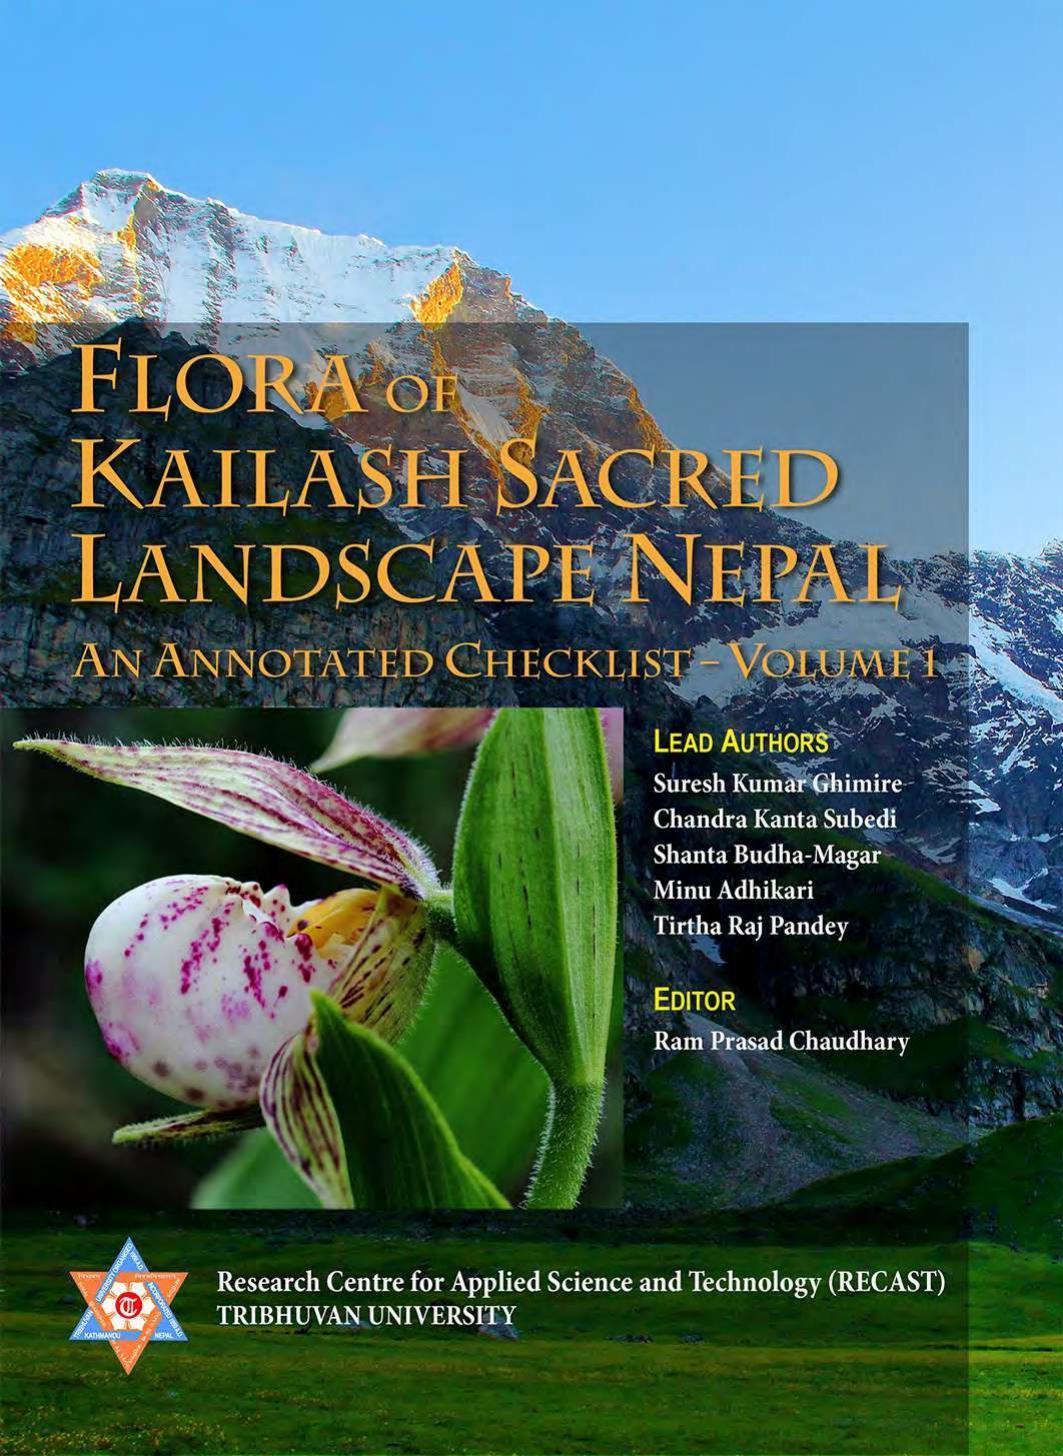 Flora of Kailash Sacred Landscape Nepal